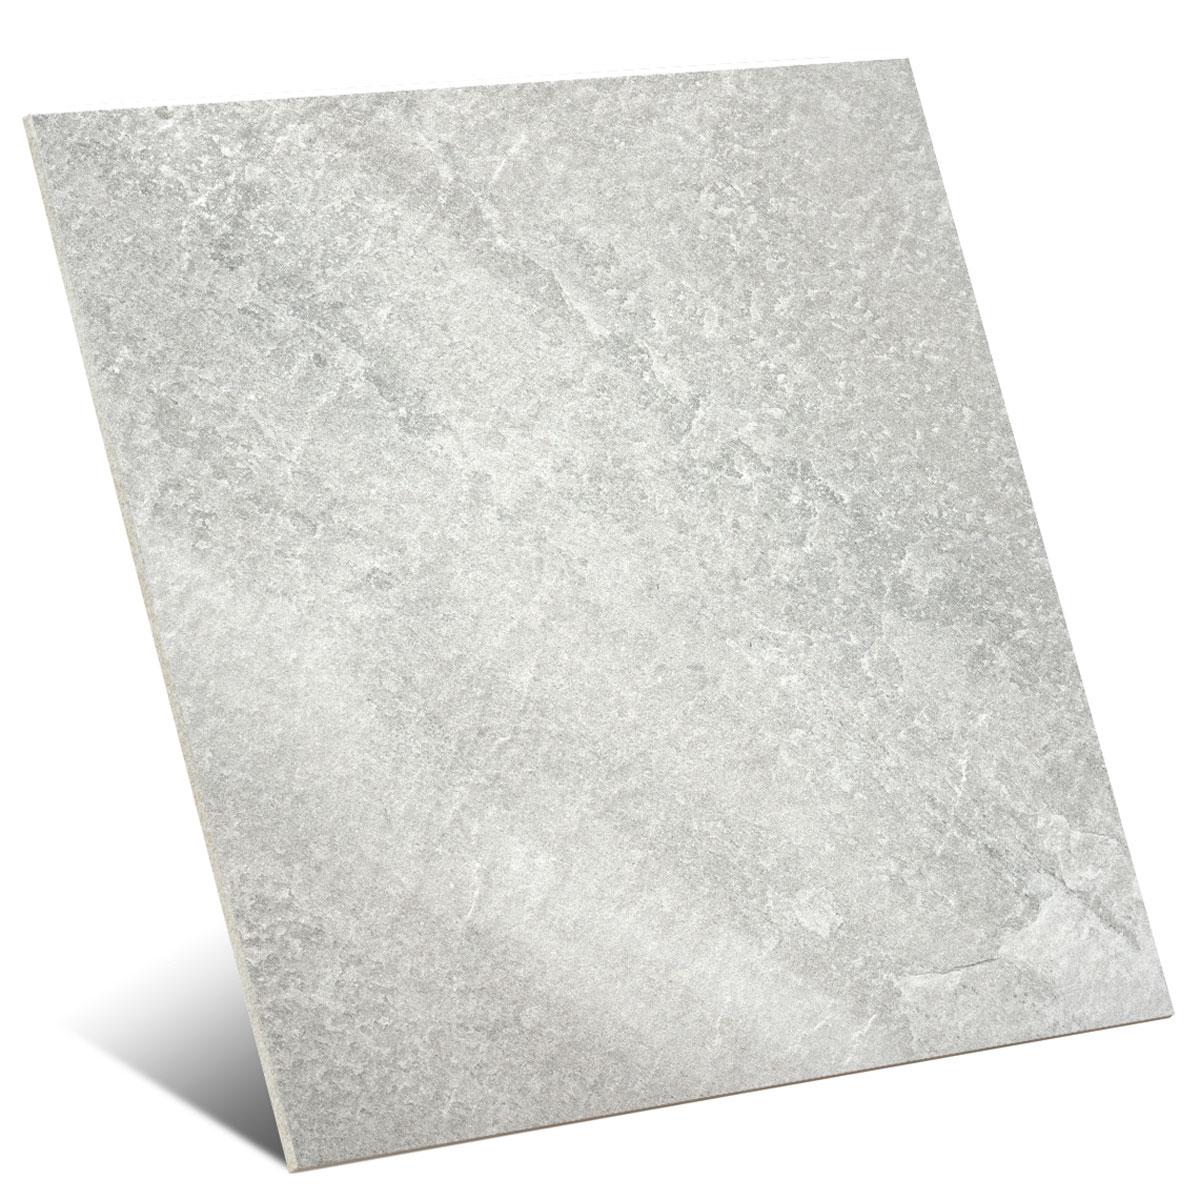 Icaria Blanco 60x60 20mm (caja 0.70 m2)